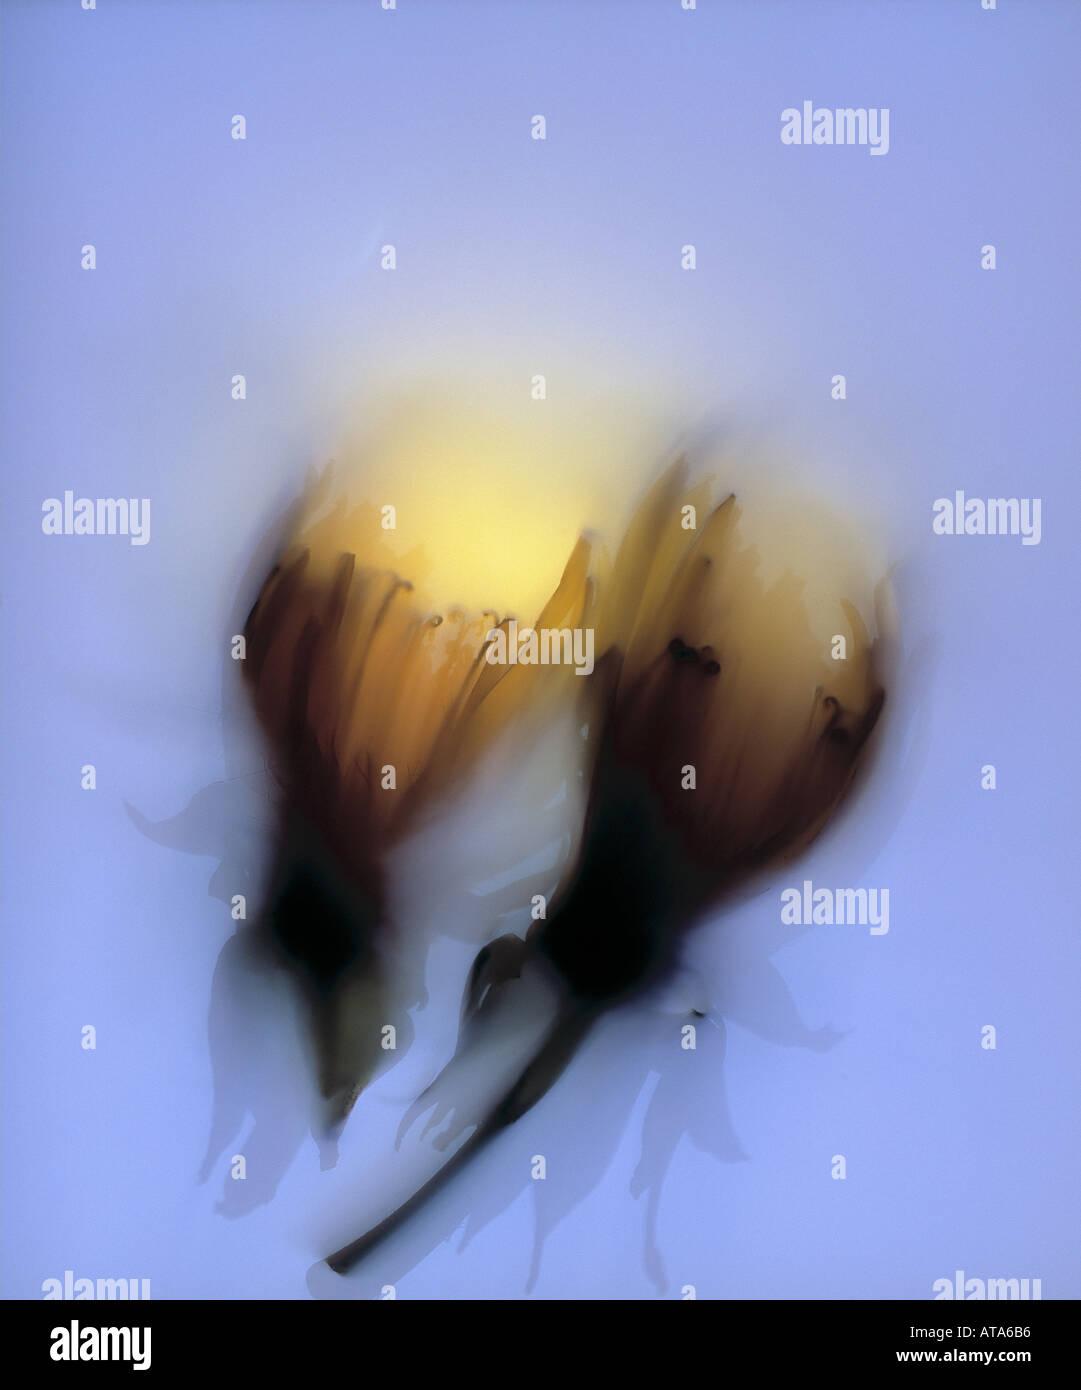 photogram of dandelions - Stock Image